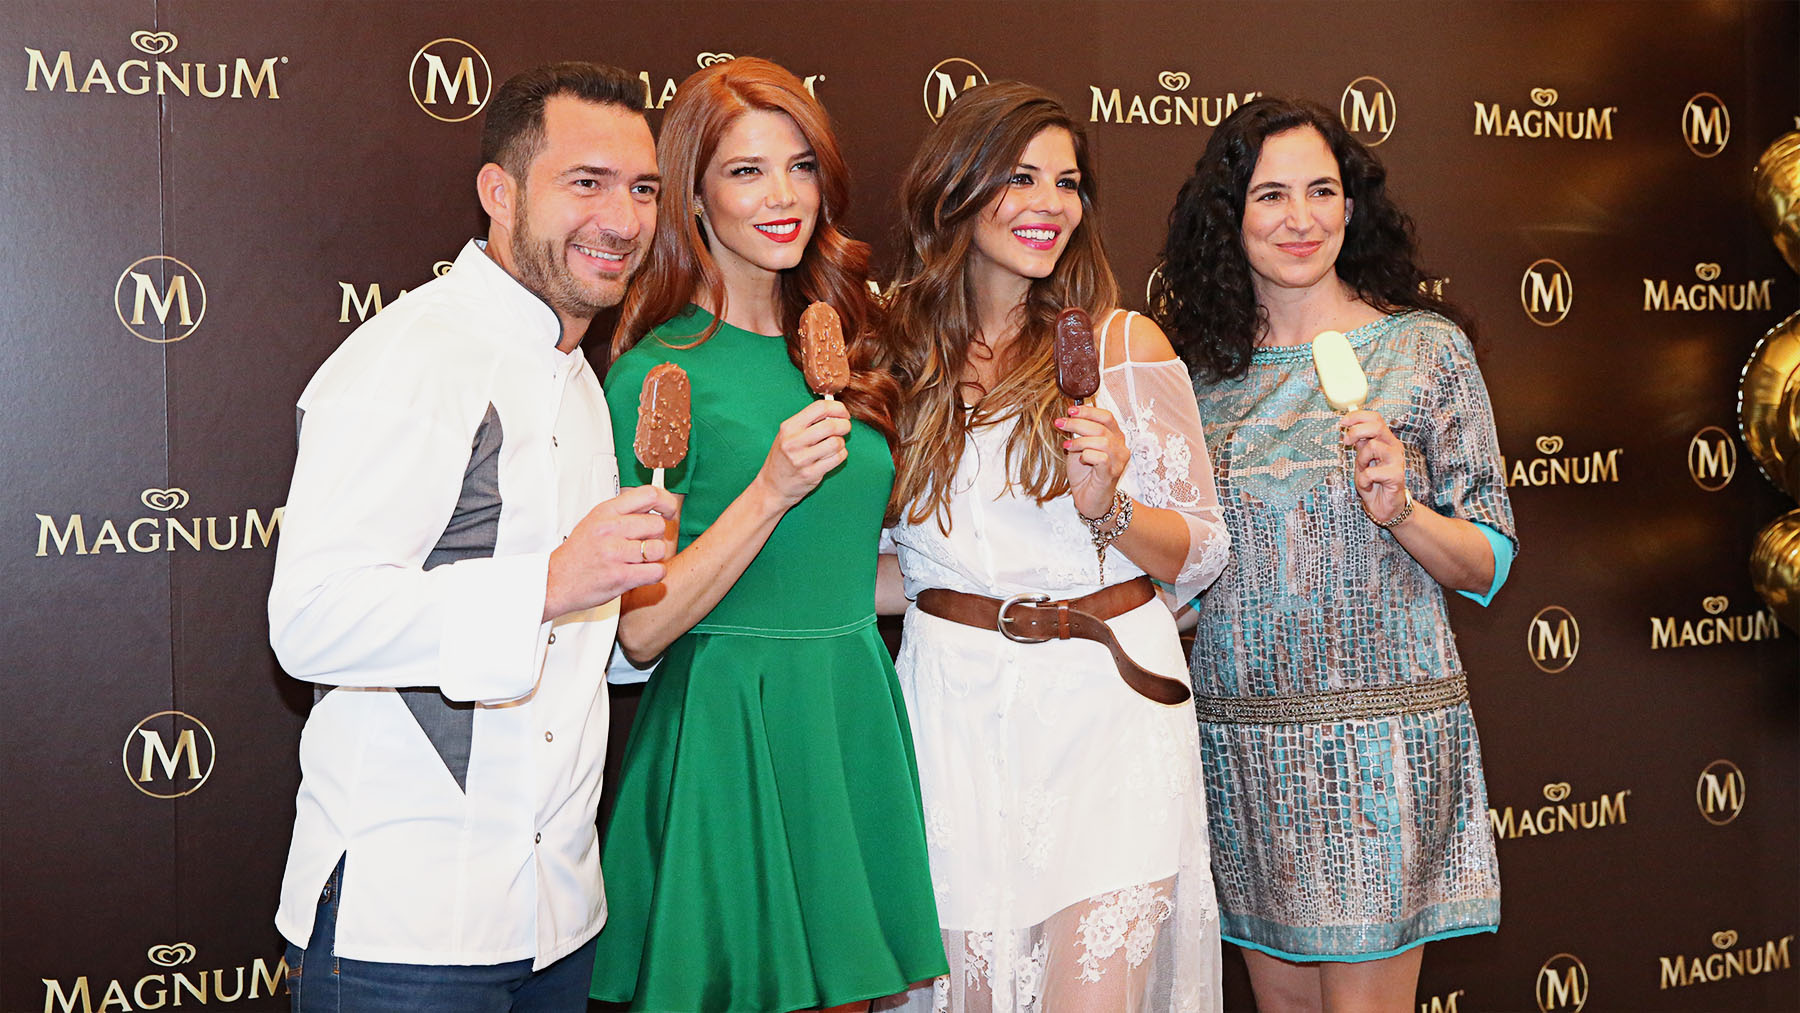 trendy-taste-look-outfit-street-style-ootd-blog-blogger-fashiopn-spain-moda-españa-magnum-juana-acosta-maje-17